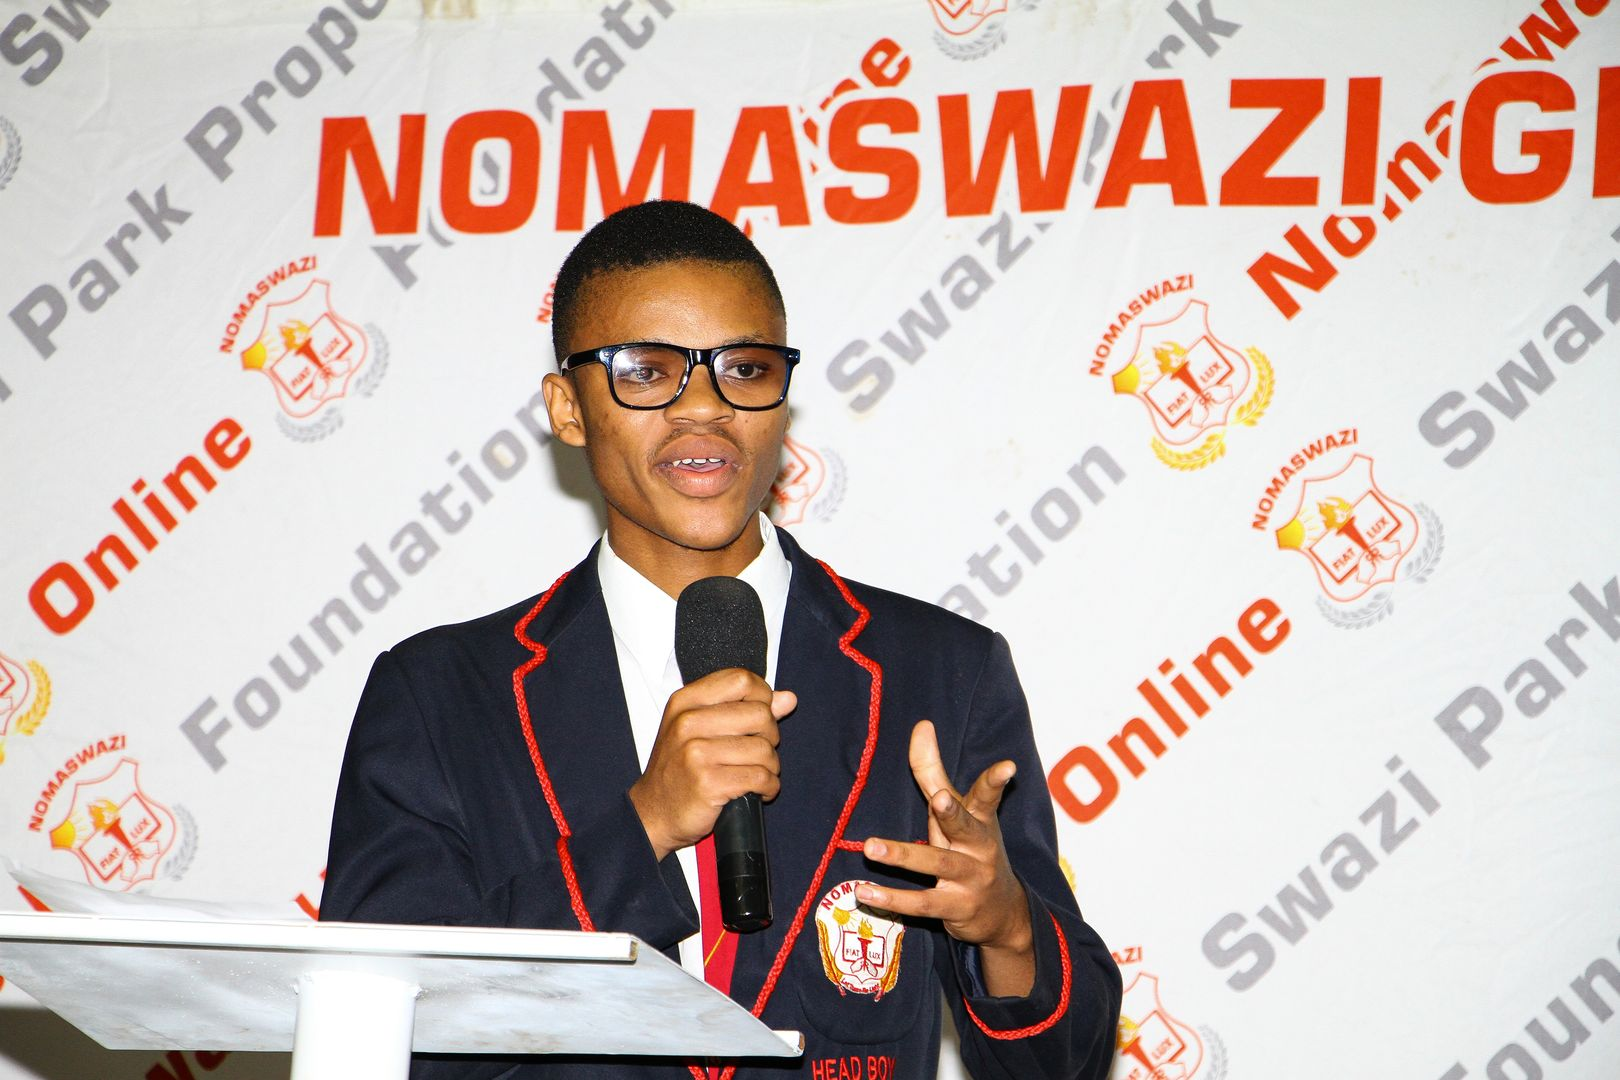 Nomaswazi High School's annual Career Day